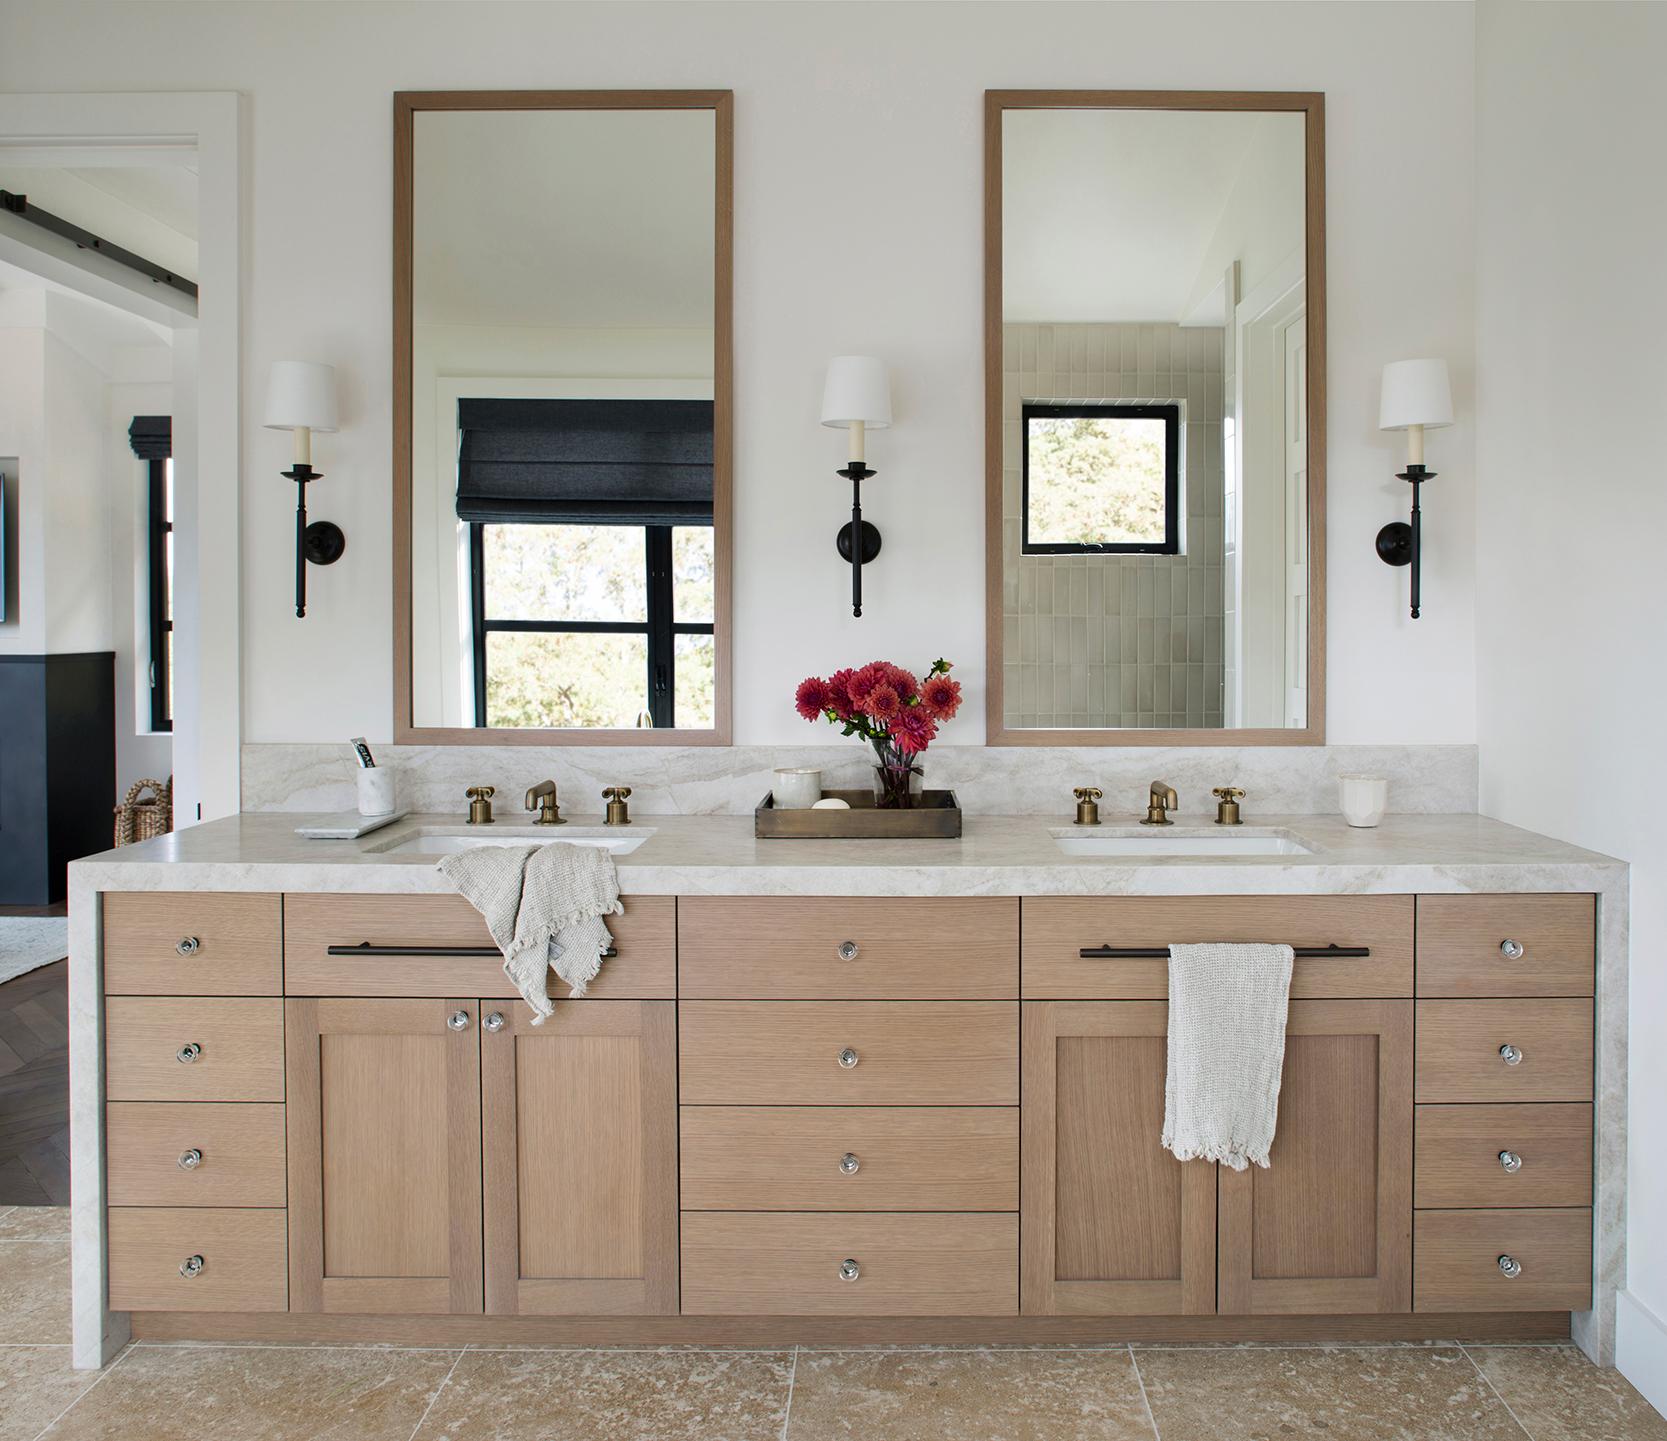 Jennifer_robins_interiors_projects_st_helena_IIII_Conn_24_HR_no_mirror_bathroom_vanity